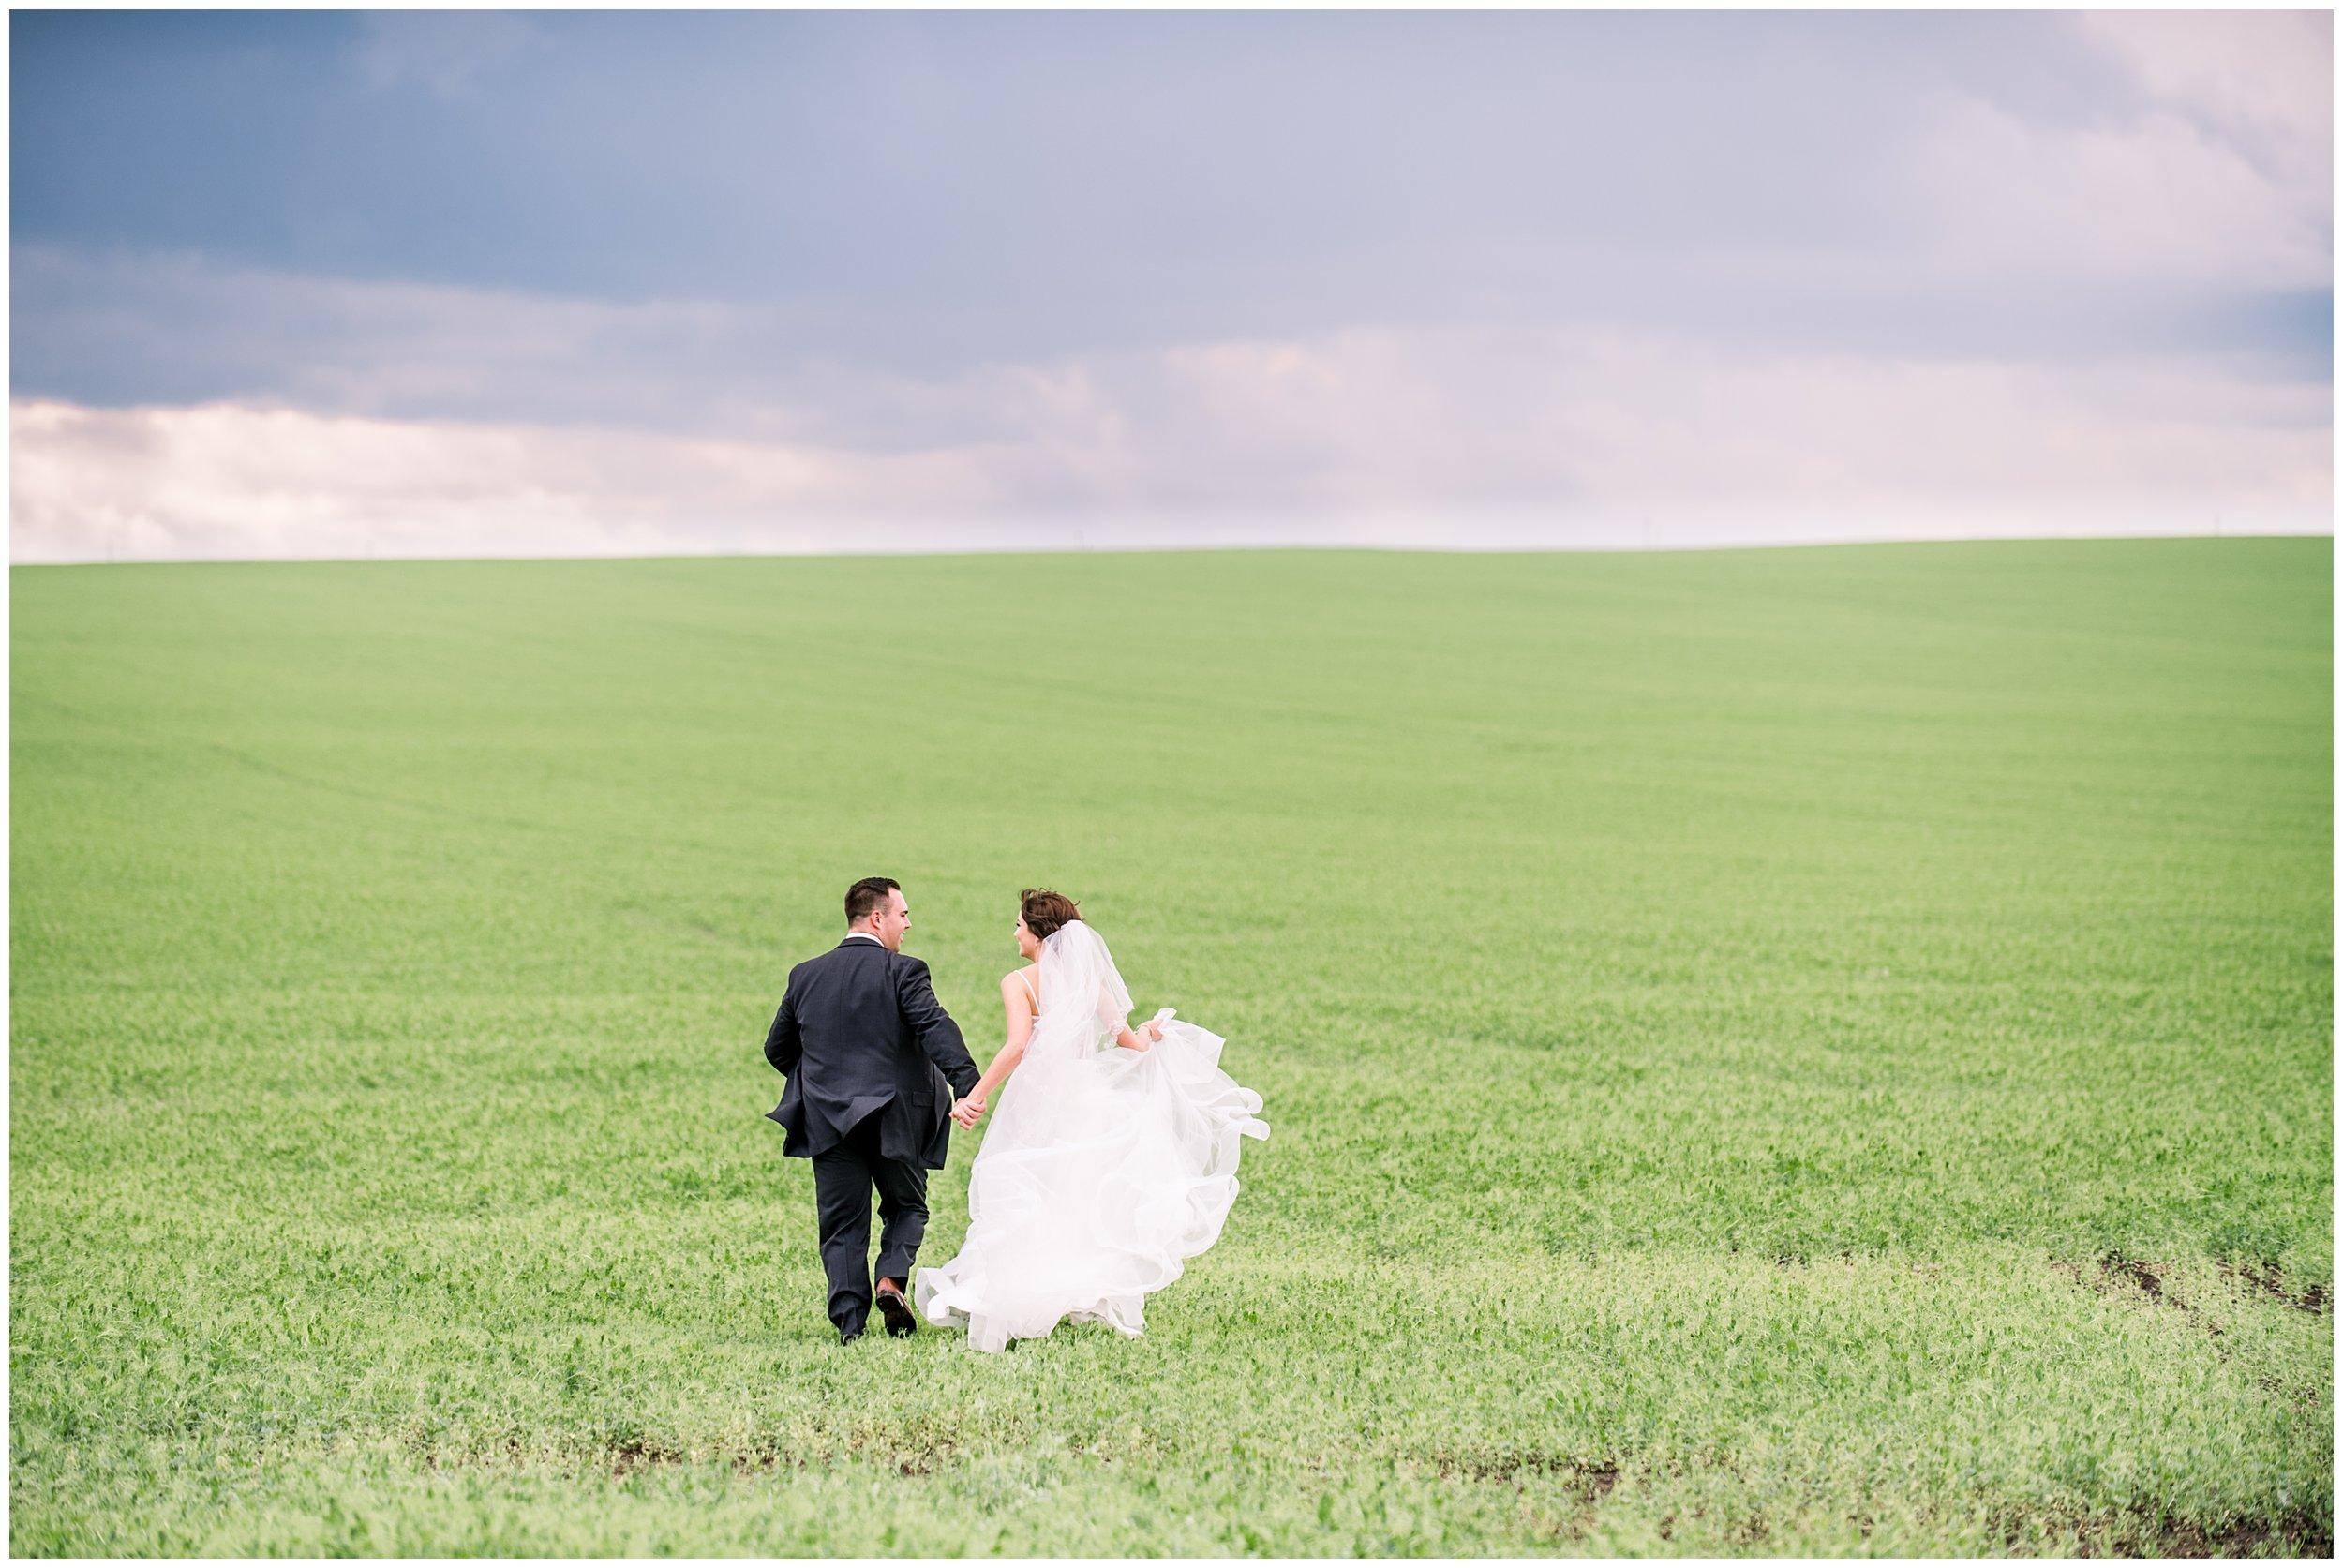 Alyssa-Poland-Photography_0630_alberta wedding.jpg